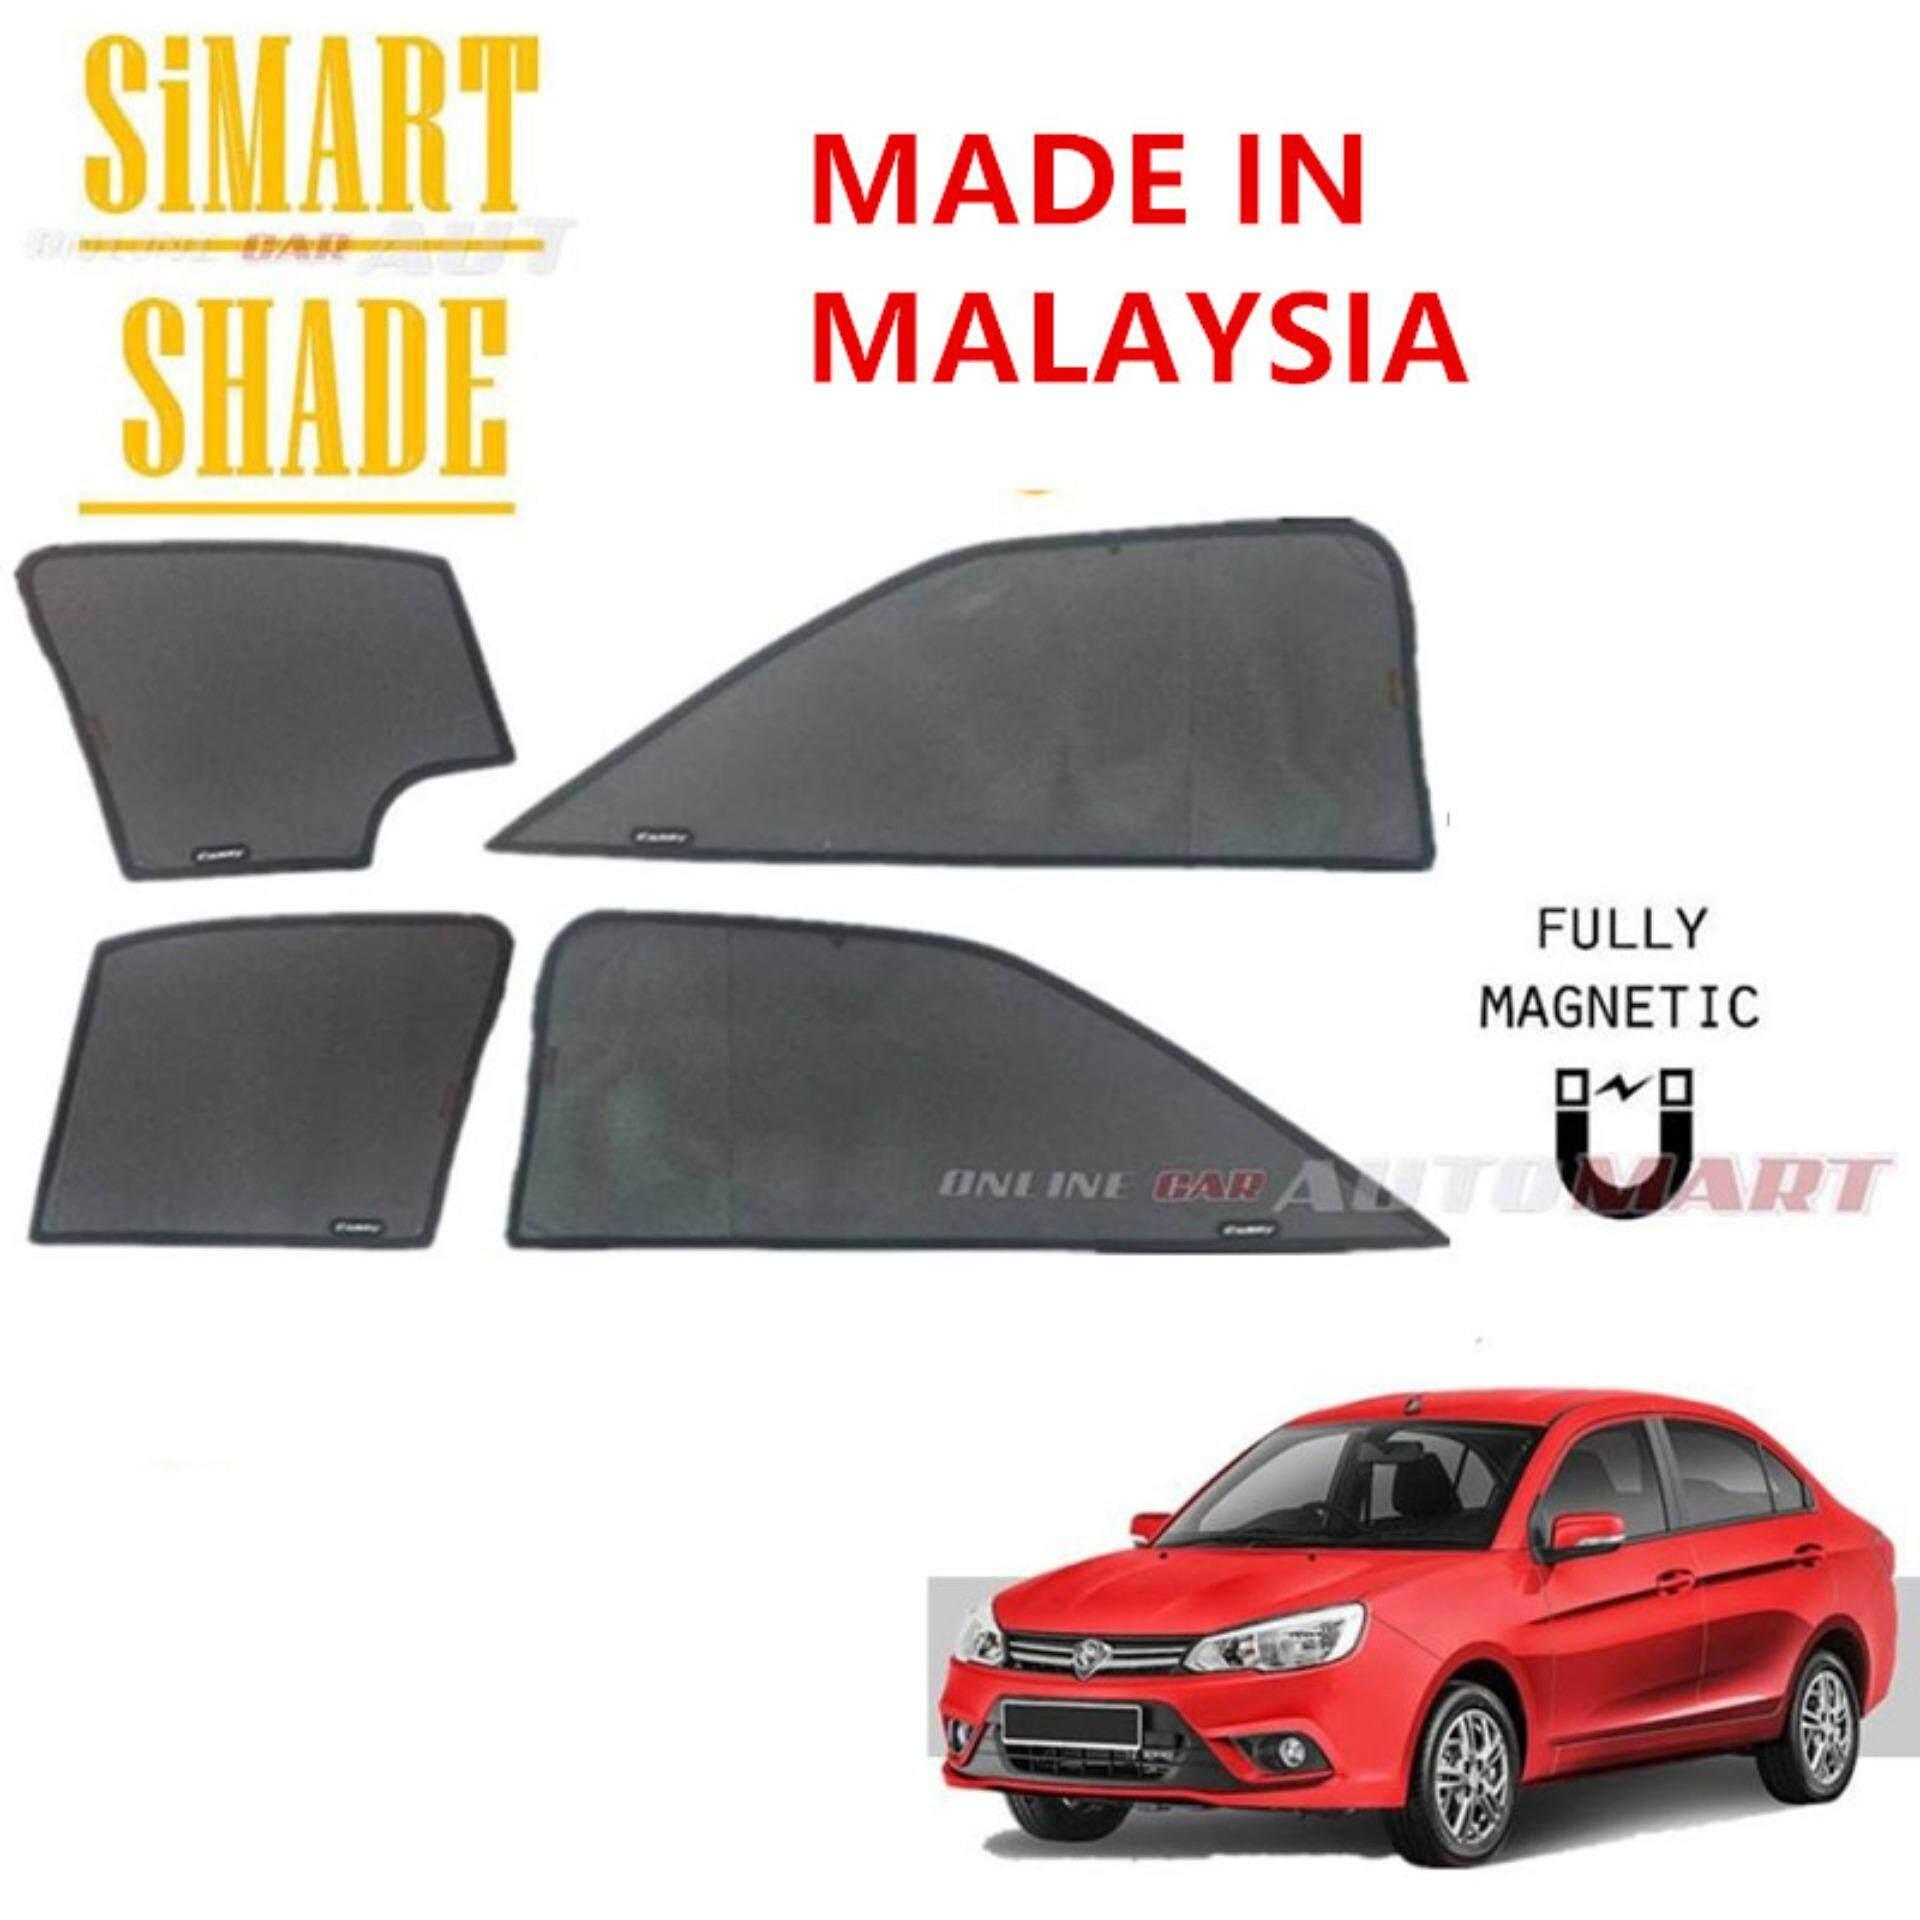 Simart Shade Magnetic Custom Fit OEM Sunshade For Proton Saga New Yr 2016 4pcs (Made In Malaysia)